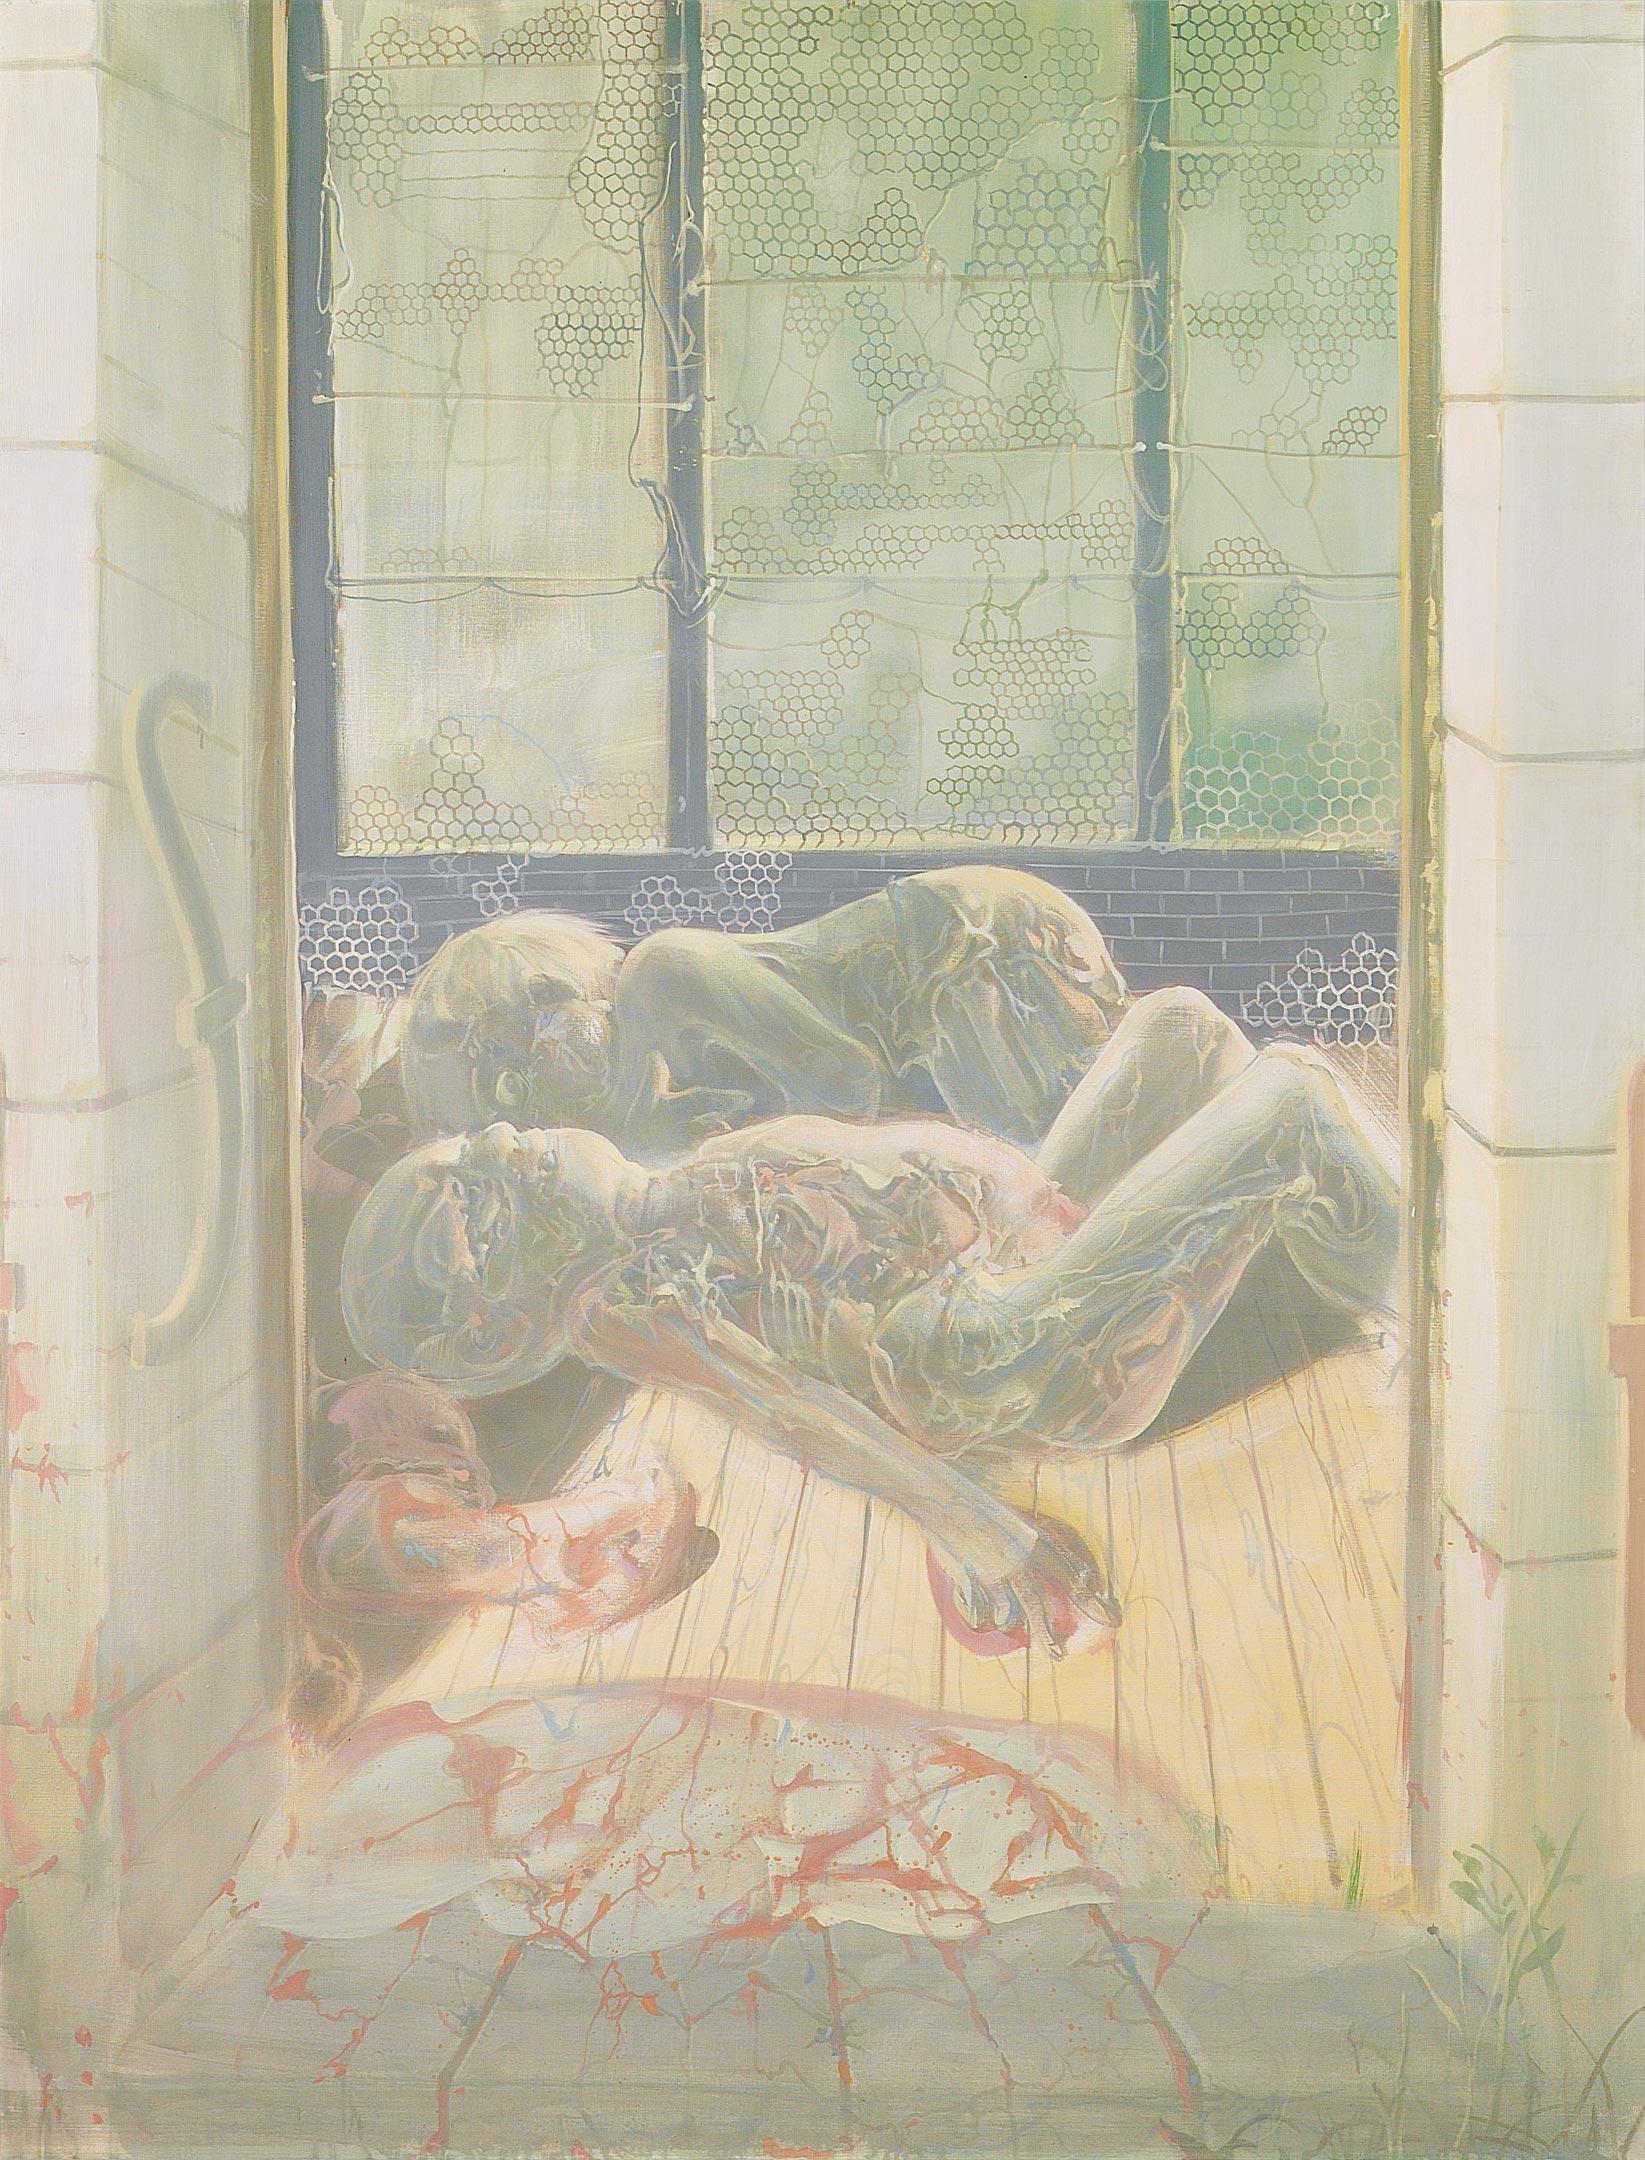 Dado: Hérouval Triptych, 1972